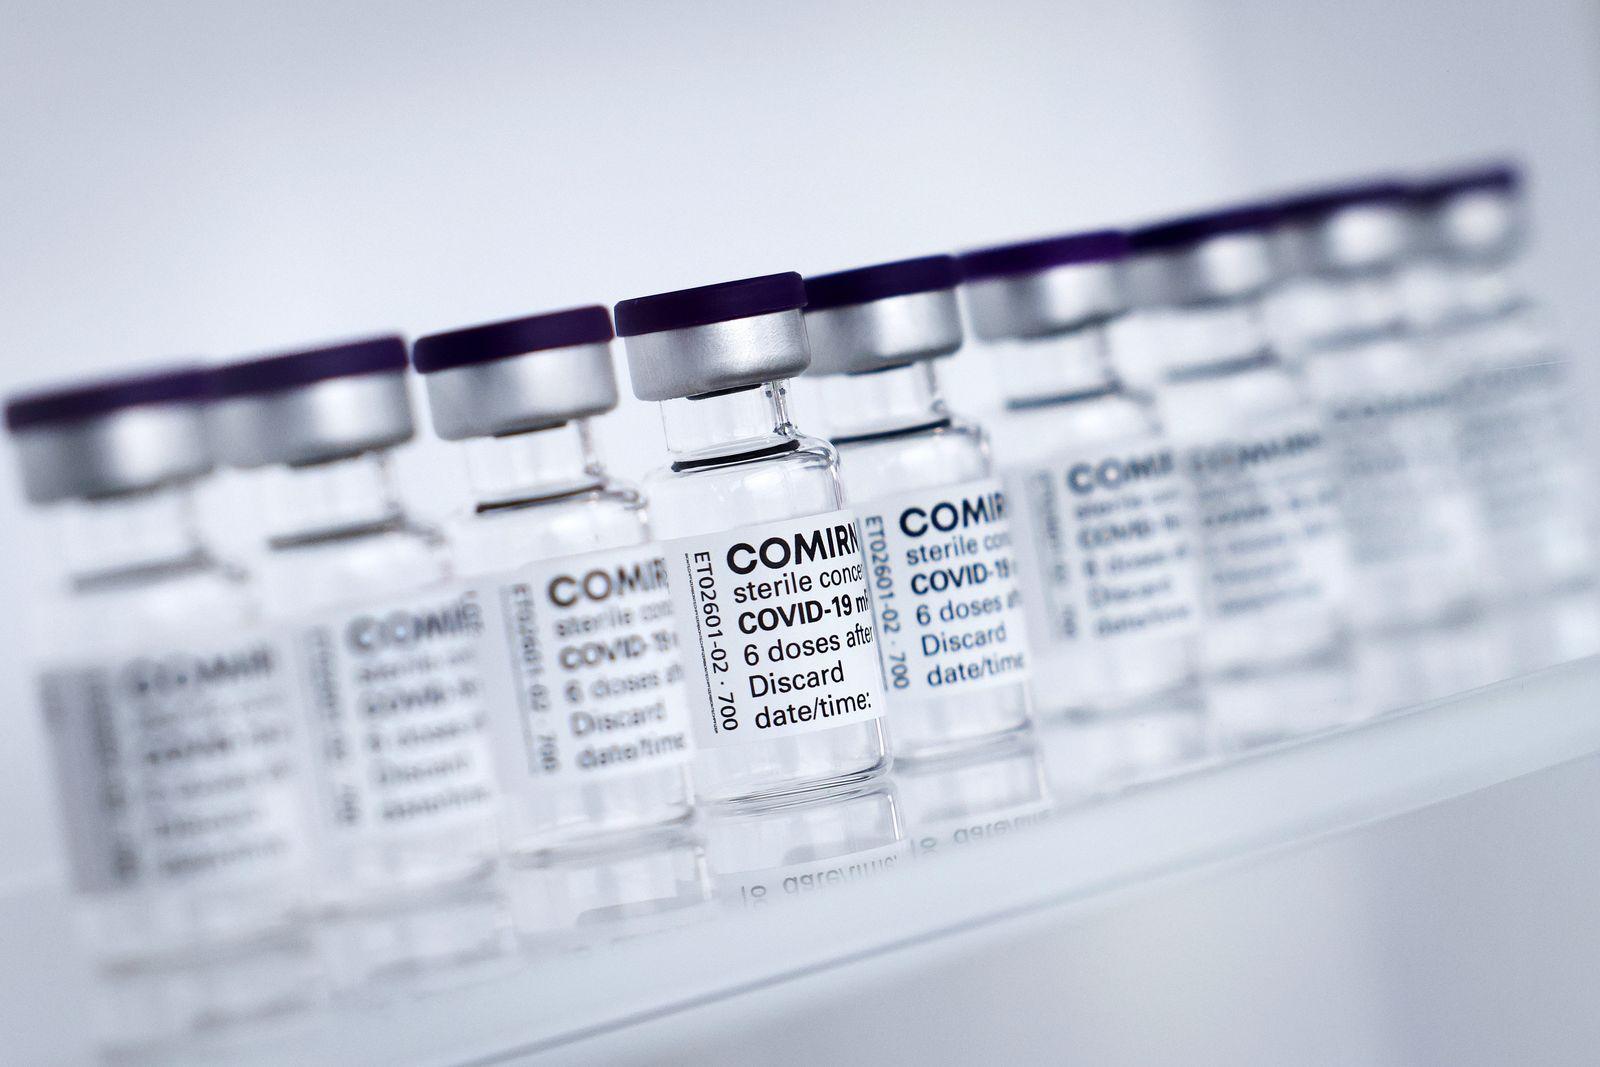 Coronavirus - Allergopharma produziert Biontech-Impfstoff